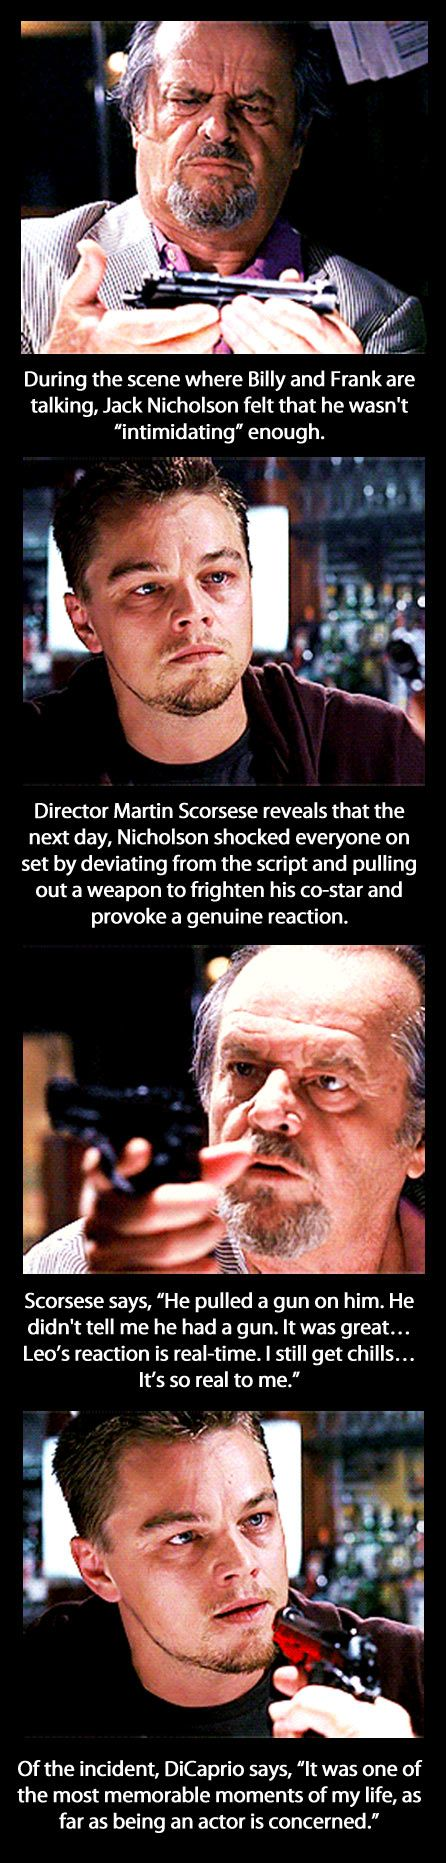 Jack Nicholson's acting method…